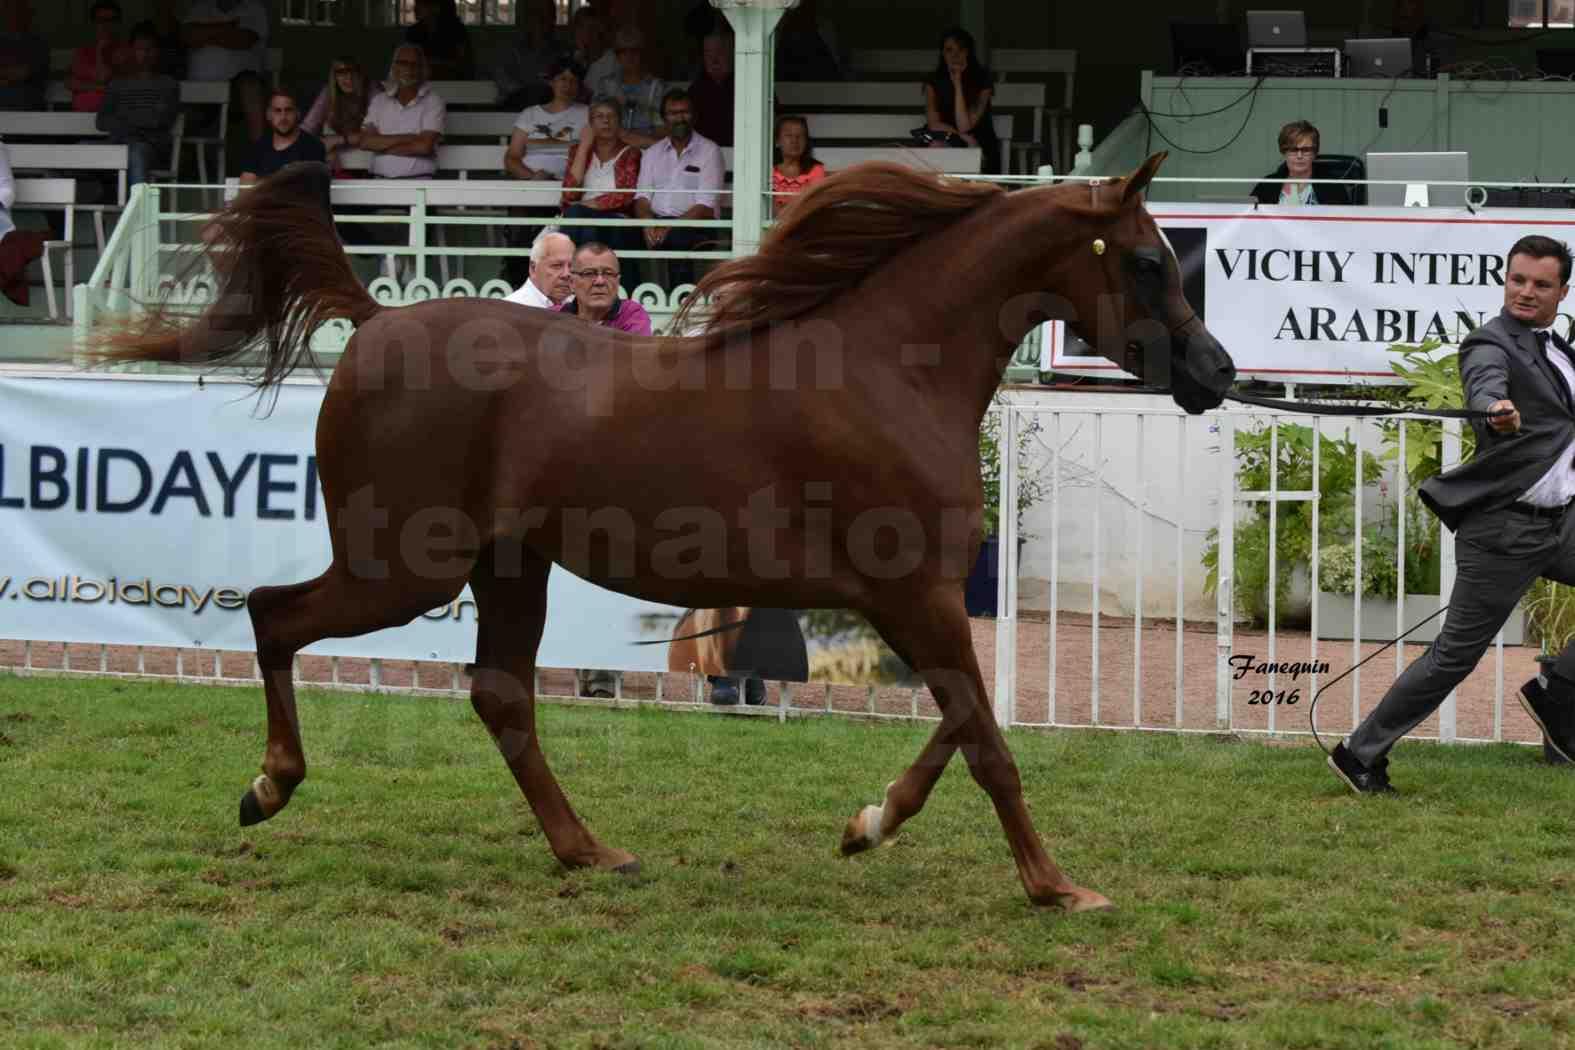 International Arabian Horse Show B de VICHY 2016 - PEARL DE DJOON - Notre Sélection - 08